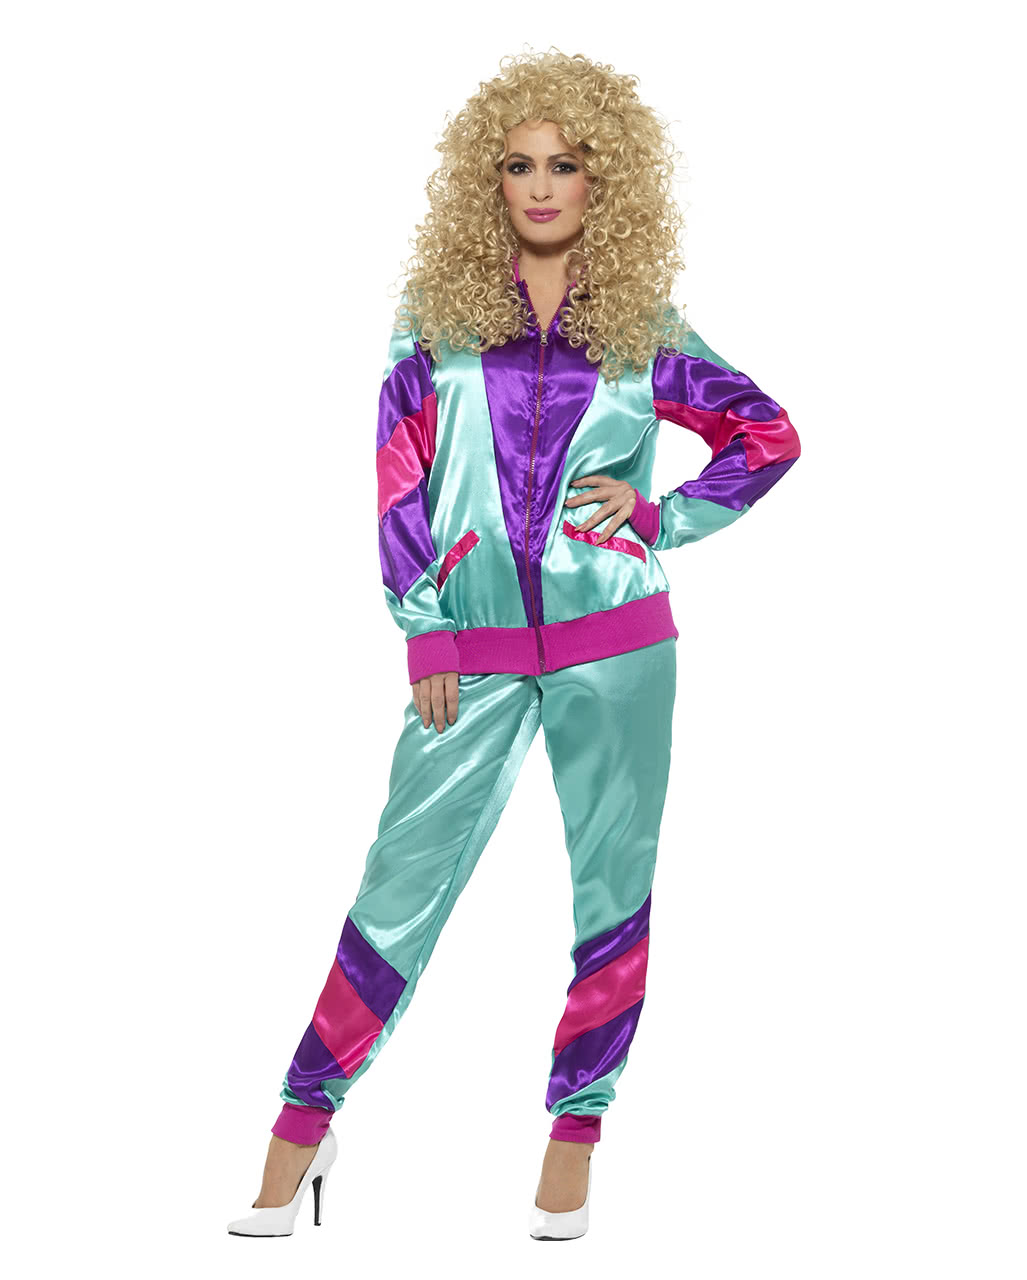 80s Jogginganzug Kostum Fur Fasching Horror Shop Com